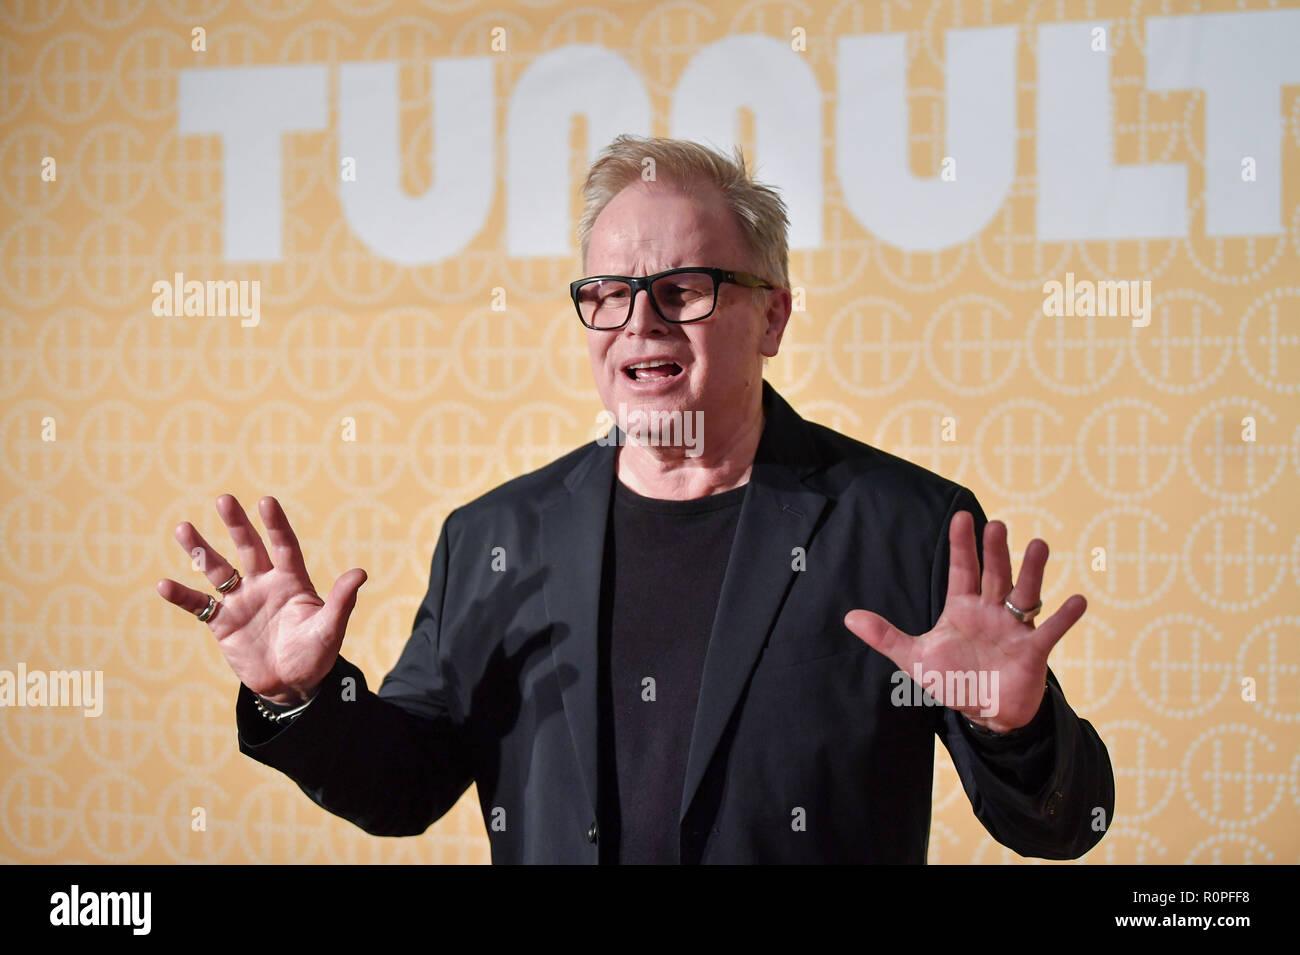 Berlin, Germany. 06th Nov, 2018. The singer Herbert Grönemeyer presents his new album 'Tumult' at the Hotel Das Stue. Credit: Jens Kalaene/dpa-Zentralbild/dpa/Alamy Live News - Stock Image